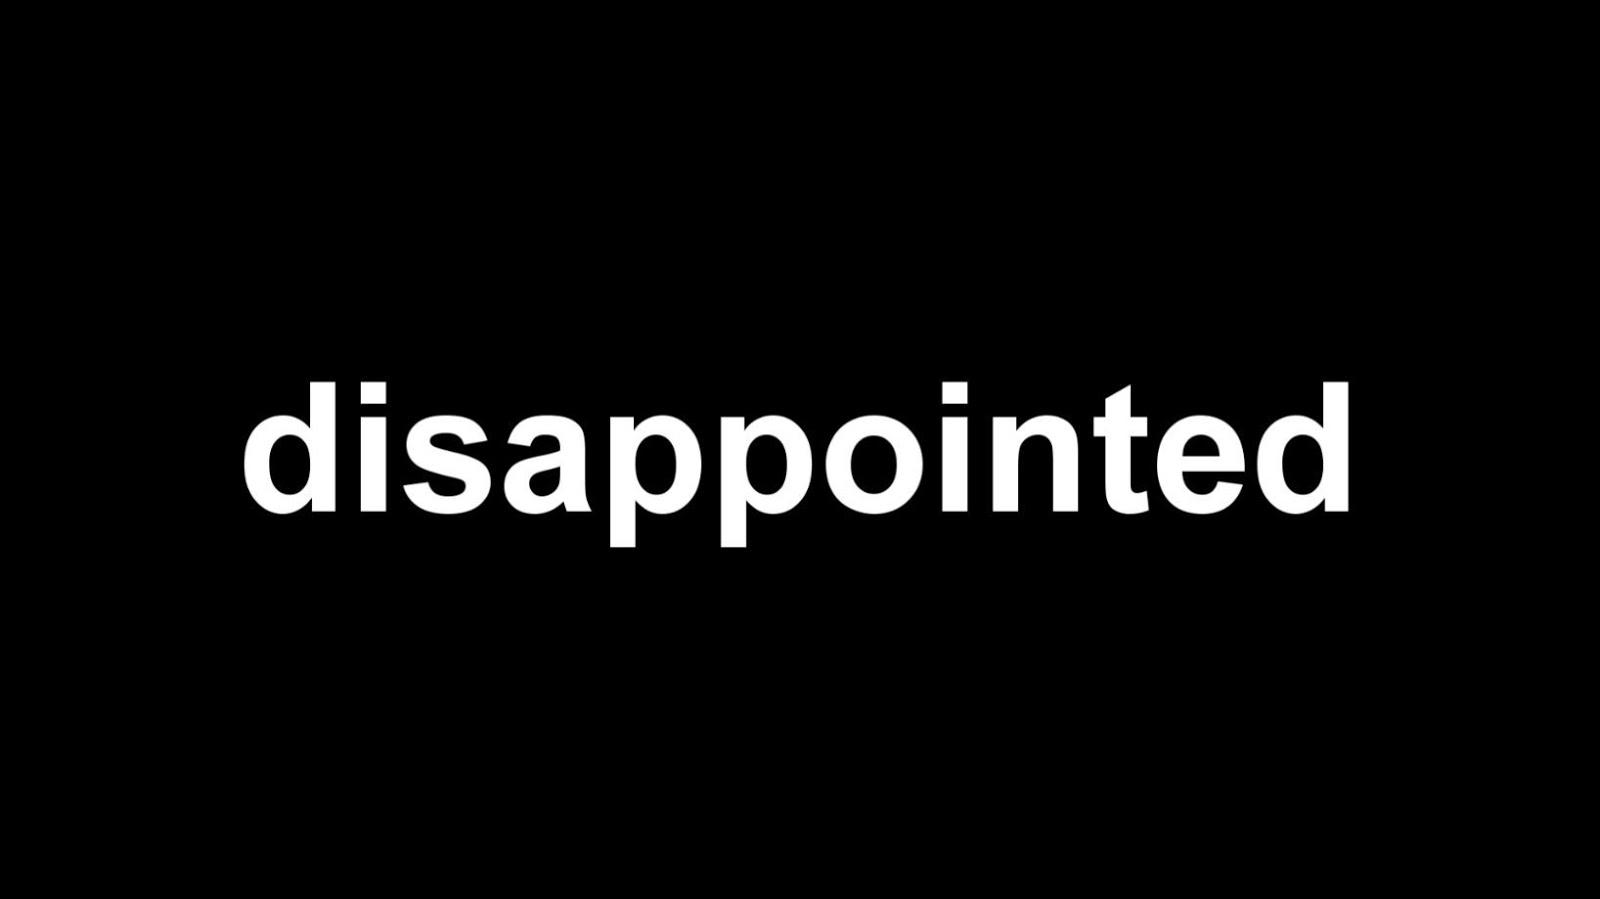 50 Kata Kata Kecewa dan Sedih Menyentuh Hati - TIPHIDUP